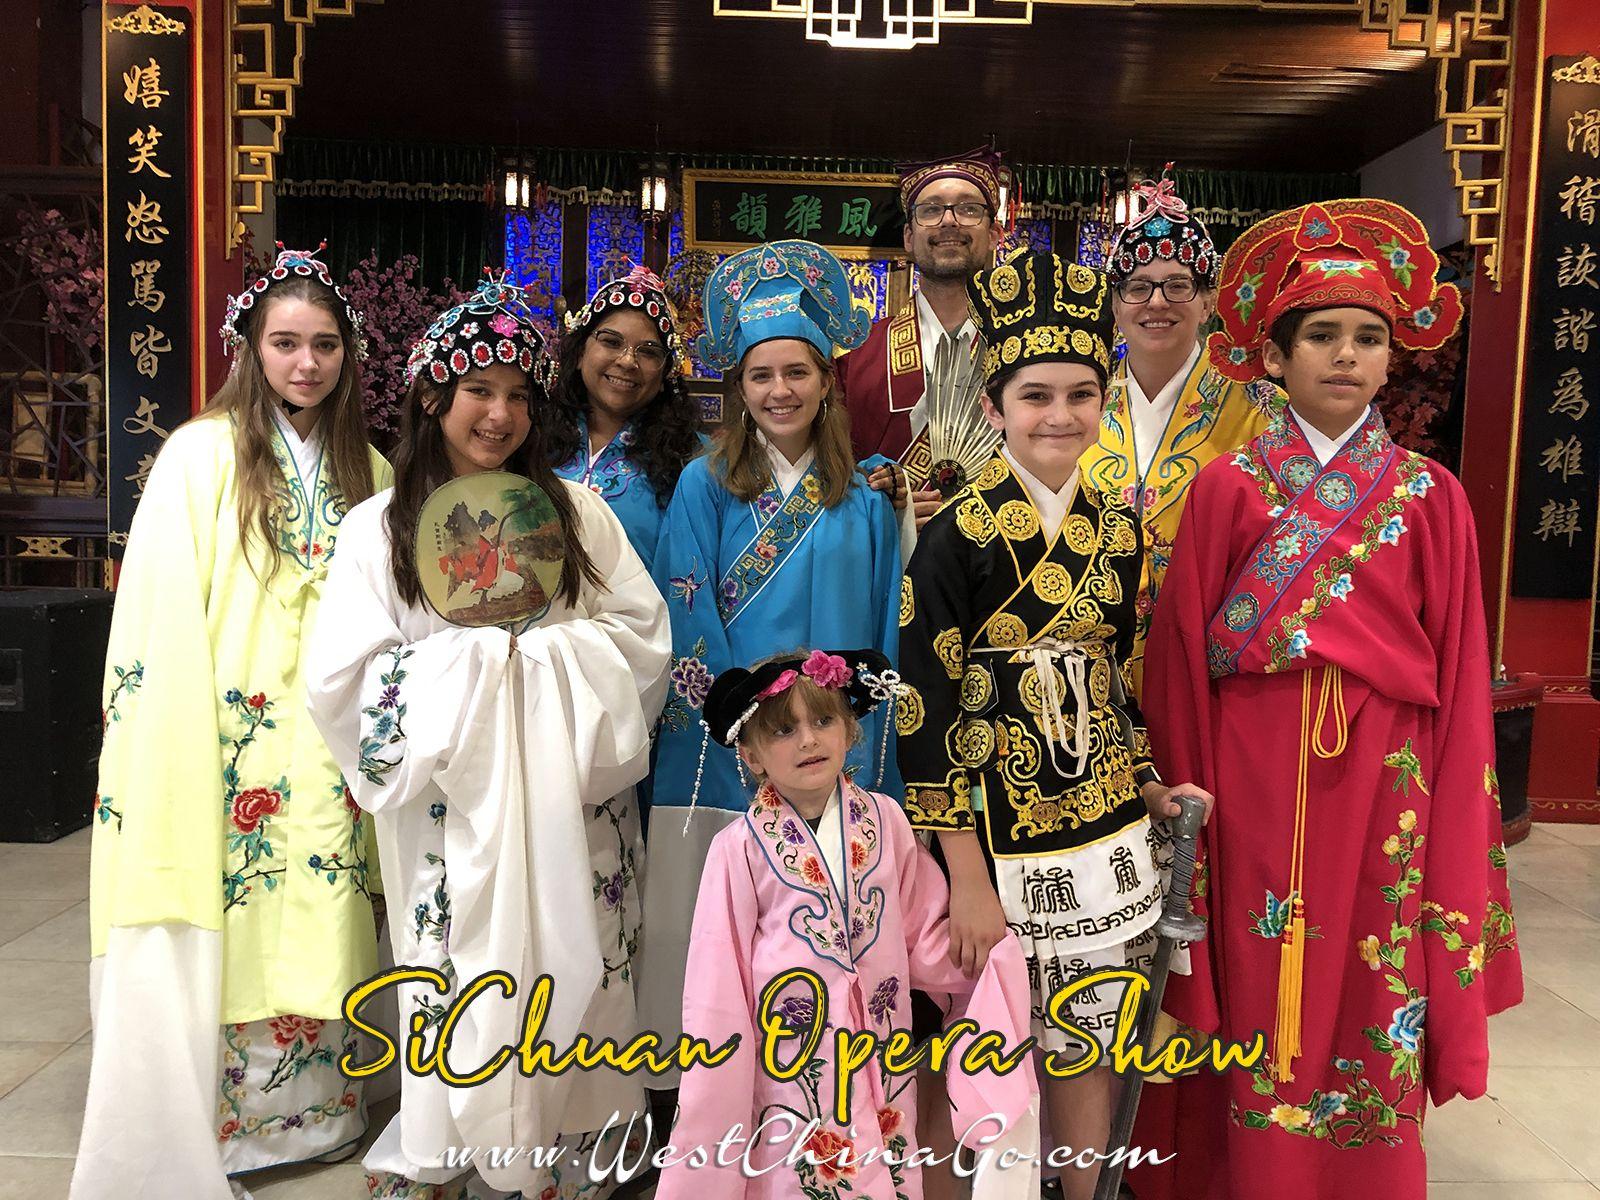 sichuan opera show